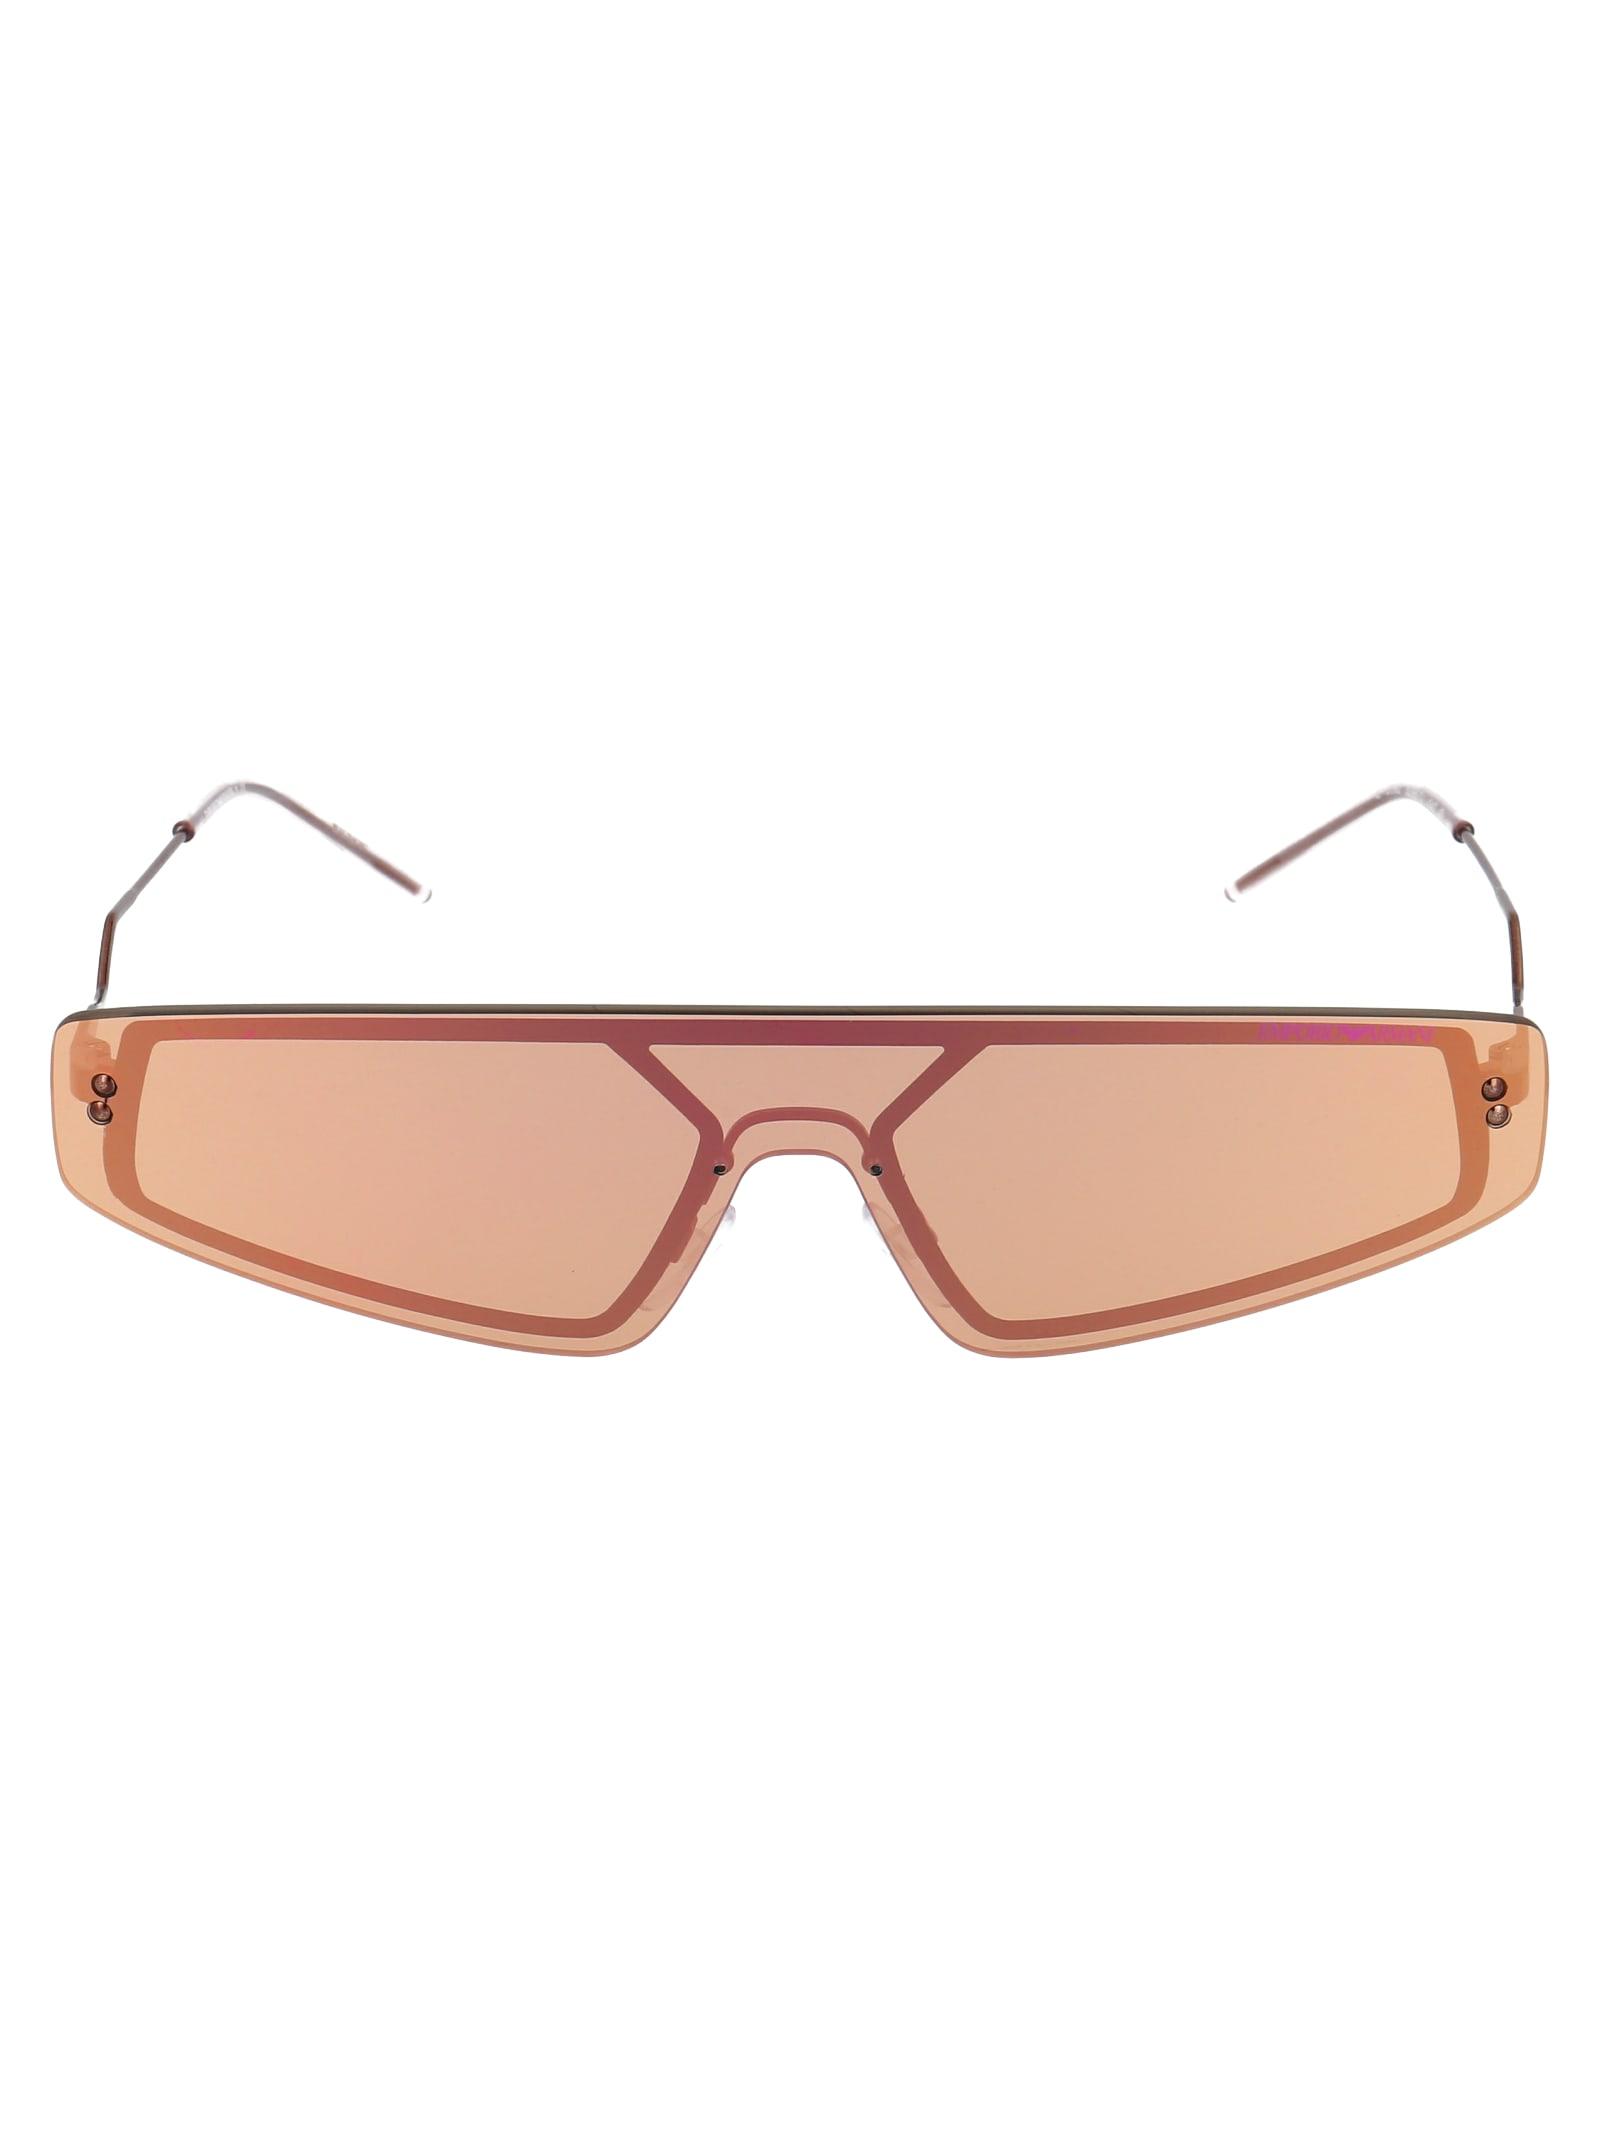 0ea2092 Sunglasses